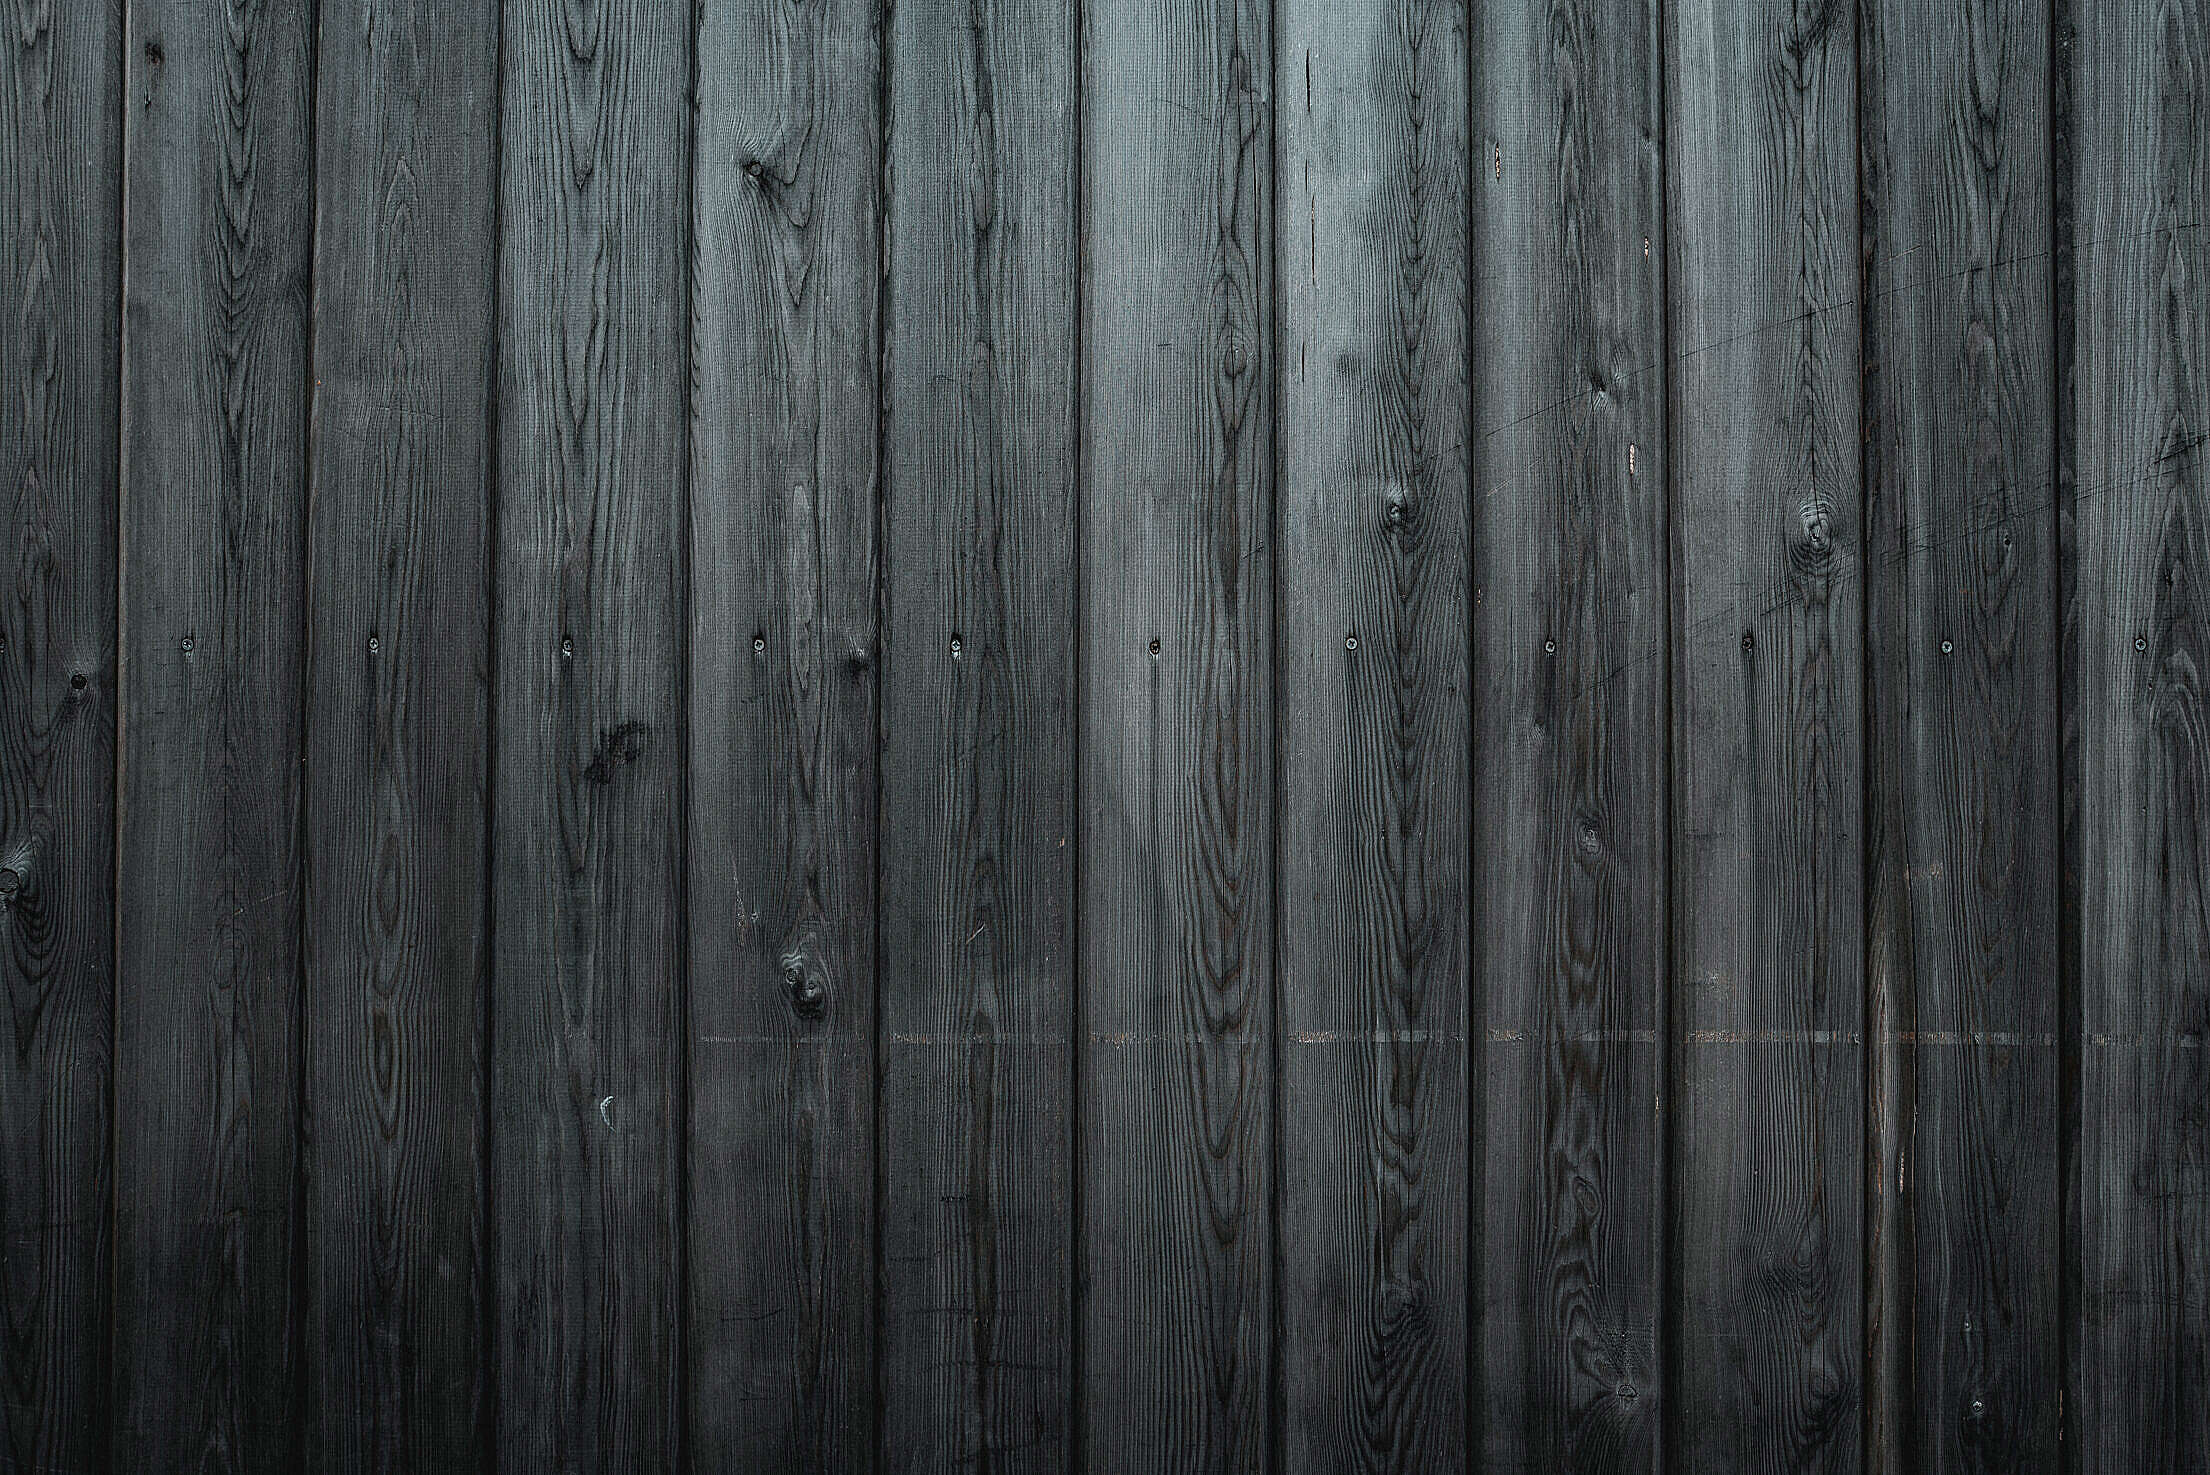 Dark Wood Texture Free Stock Photo